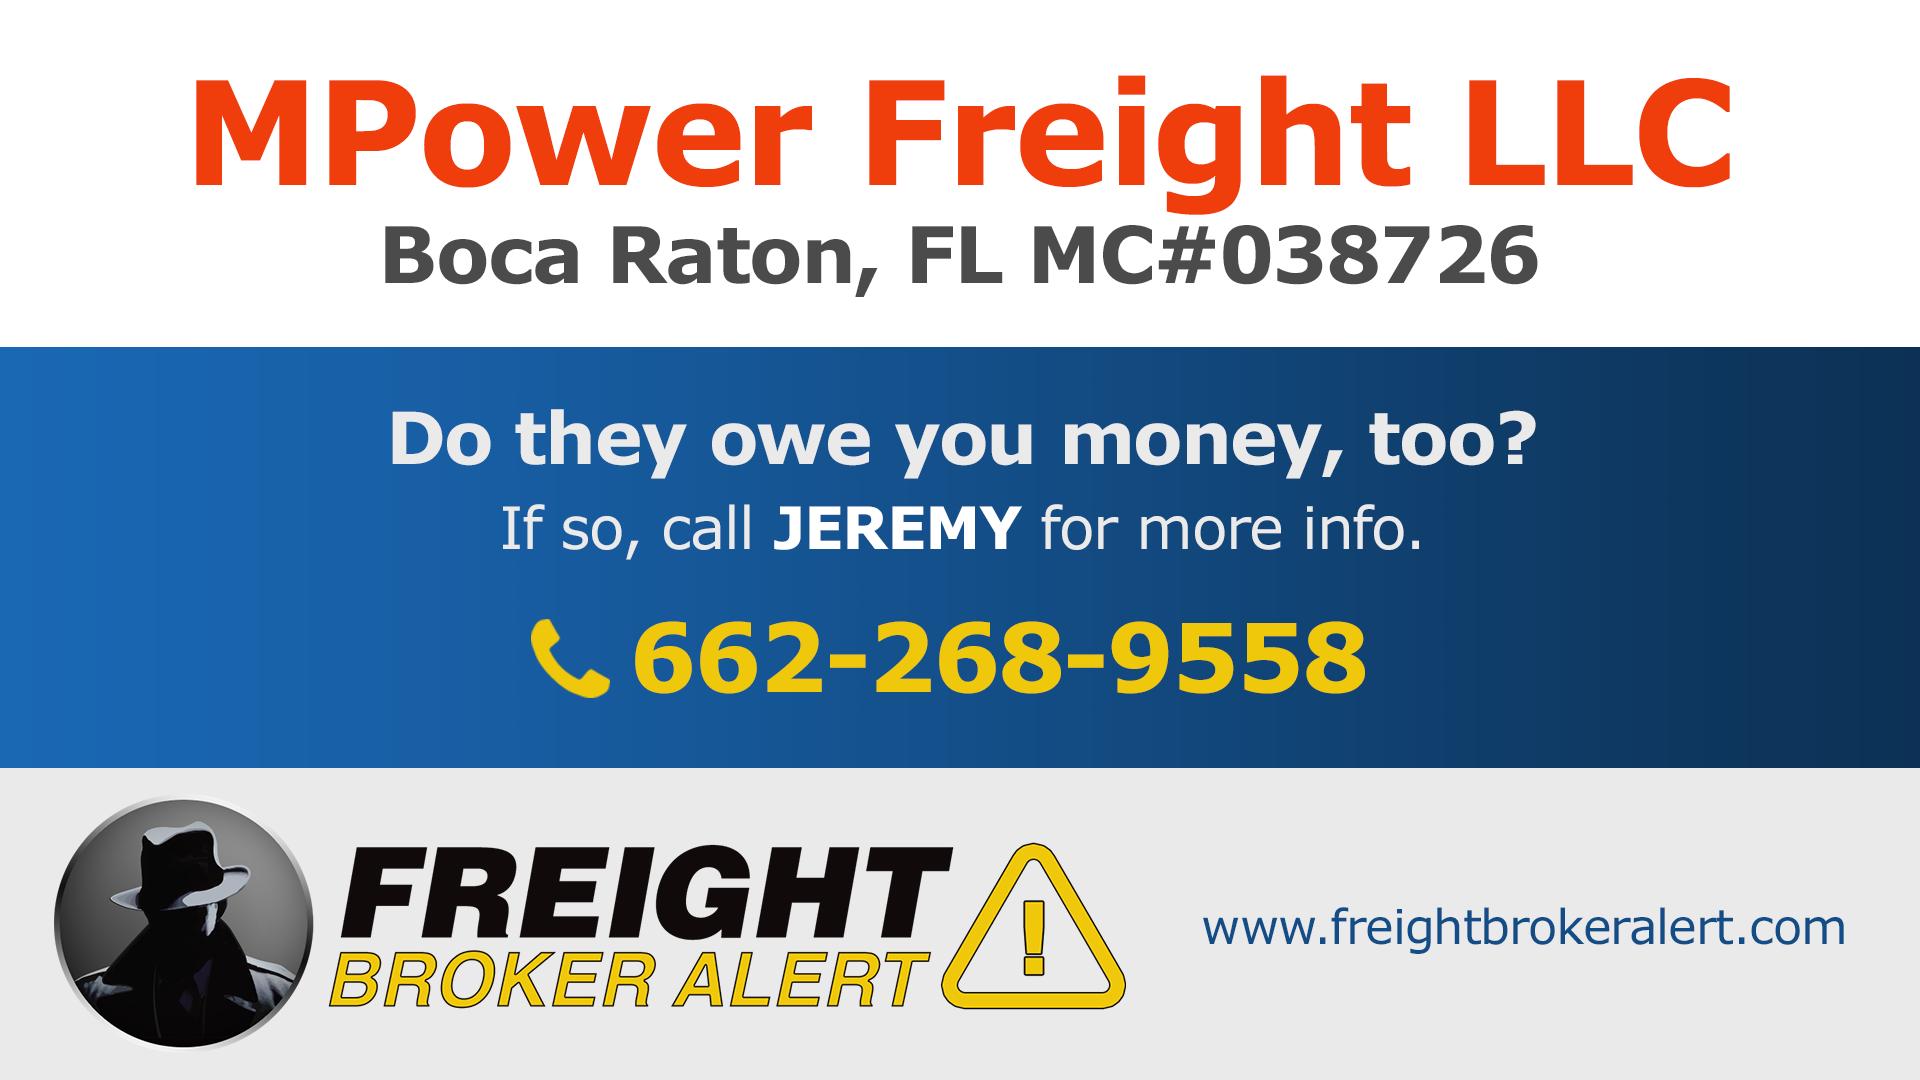 MPower Freight LLC Florida